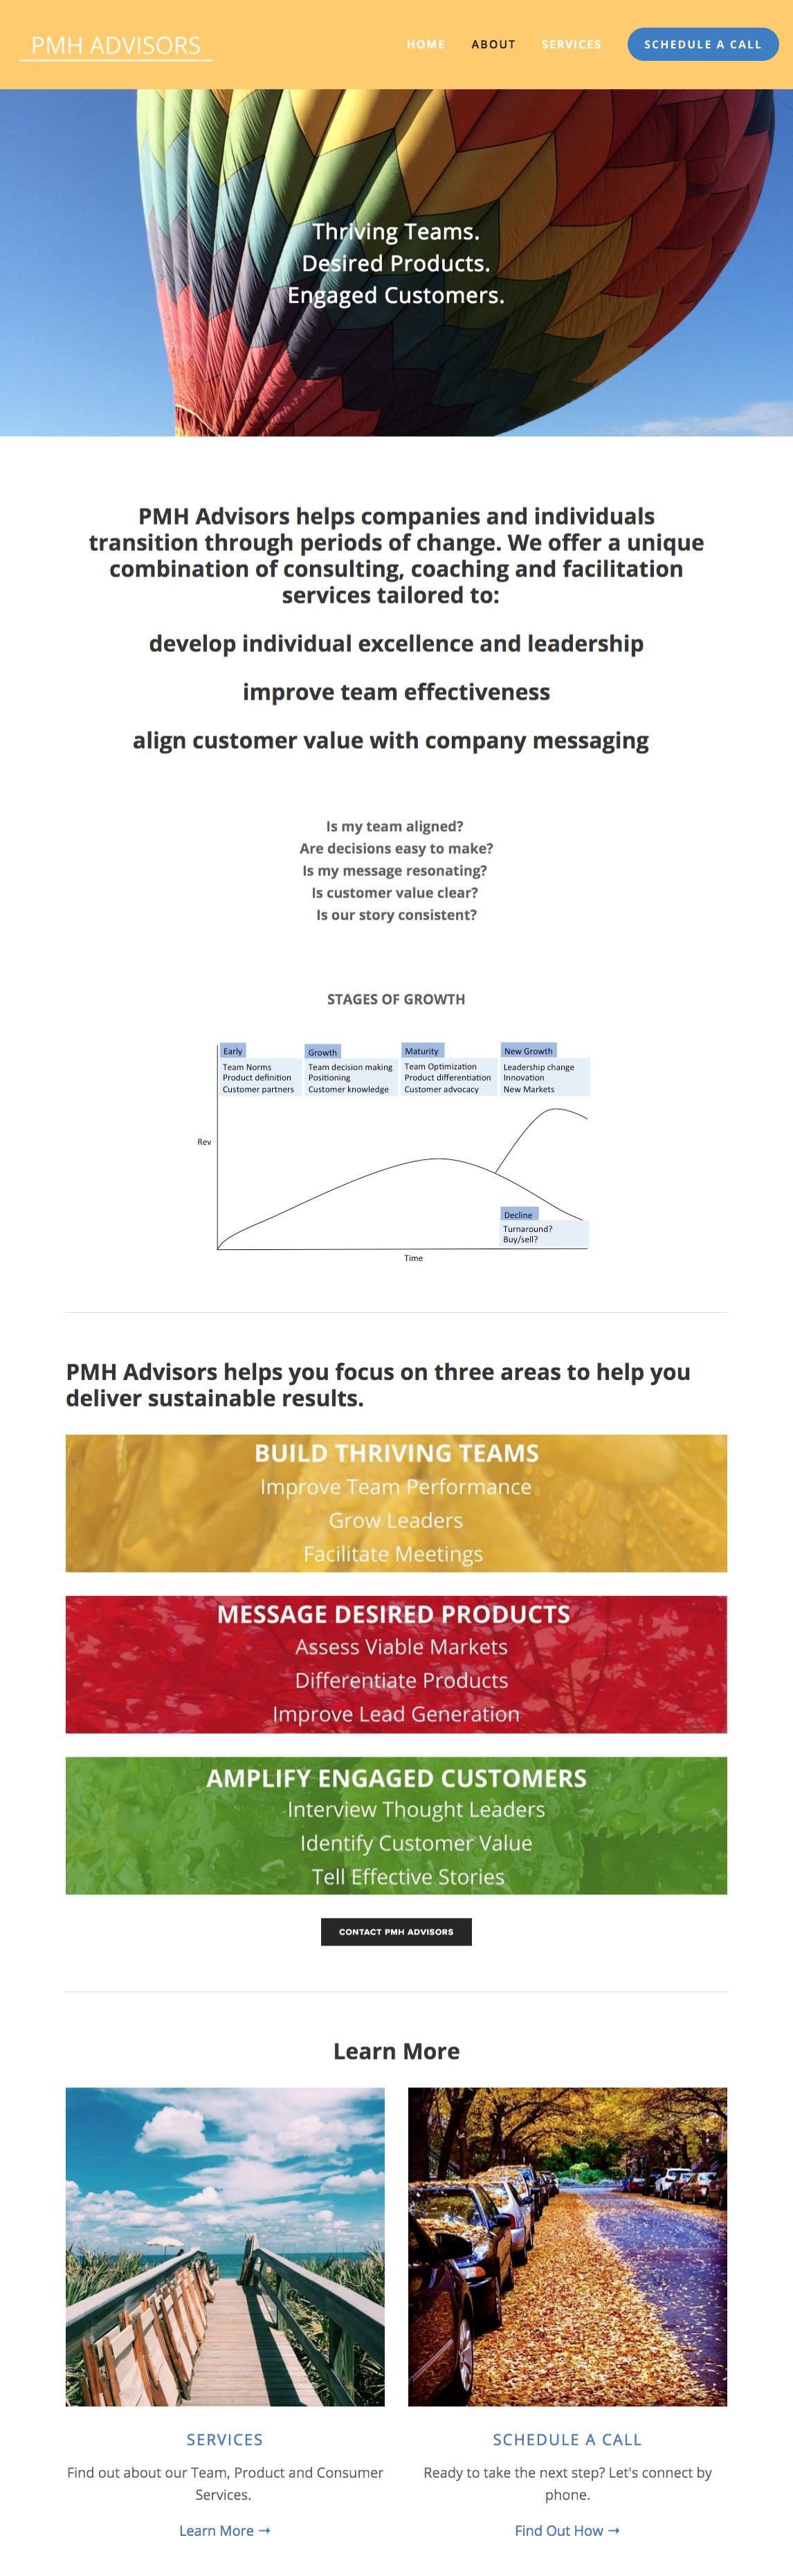 PMH Advisors.png